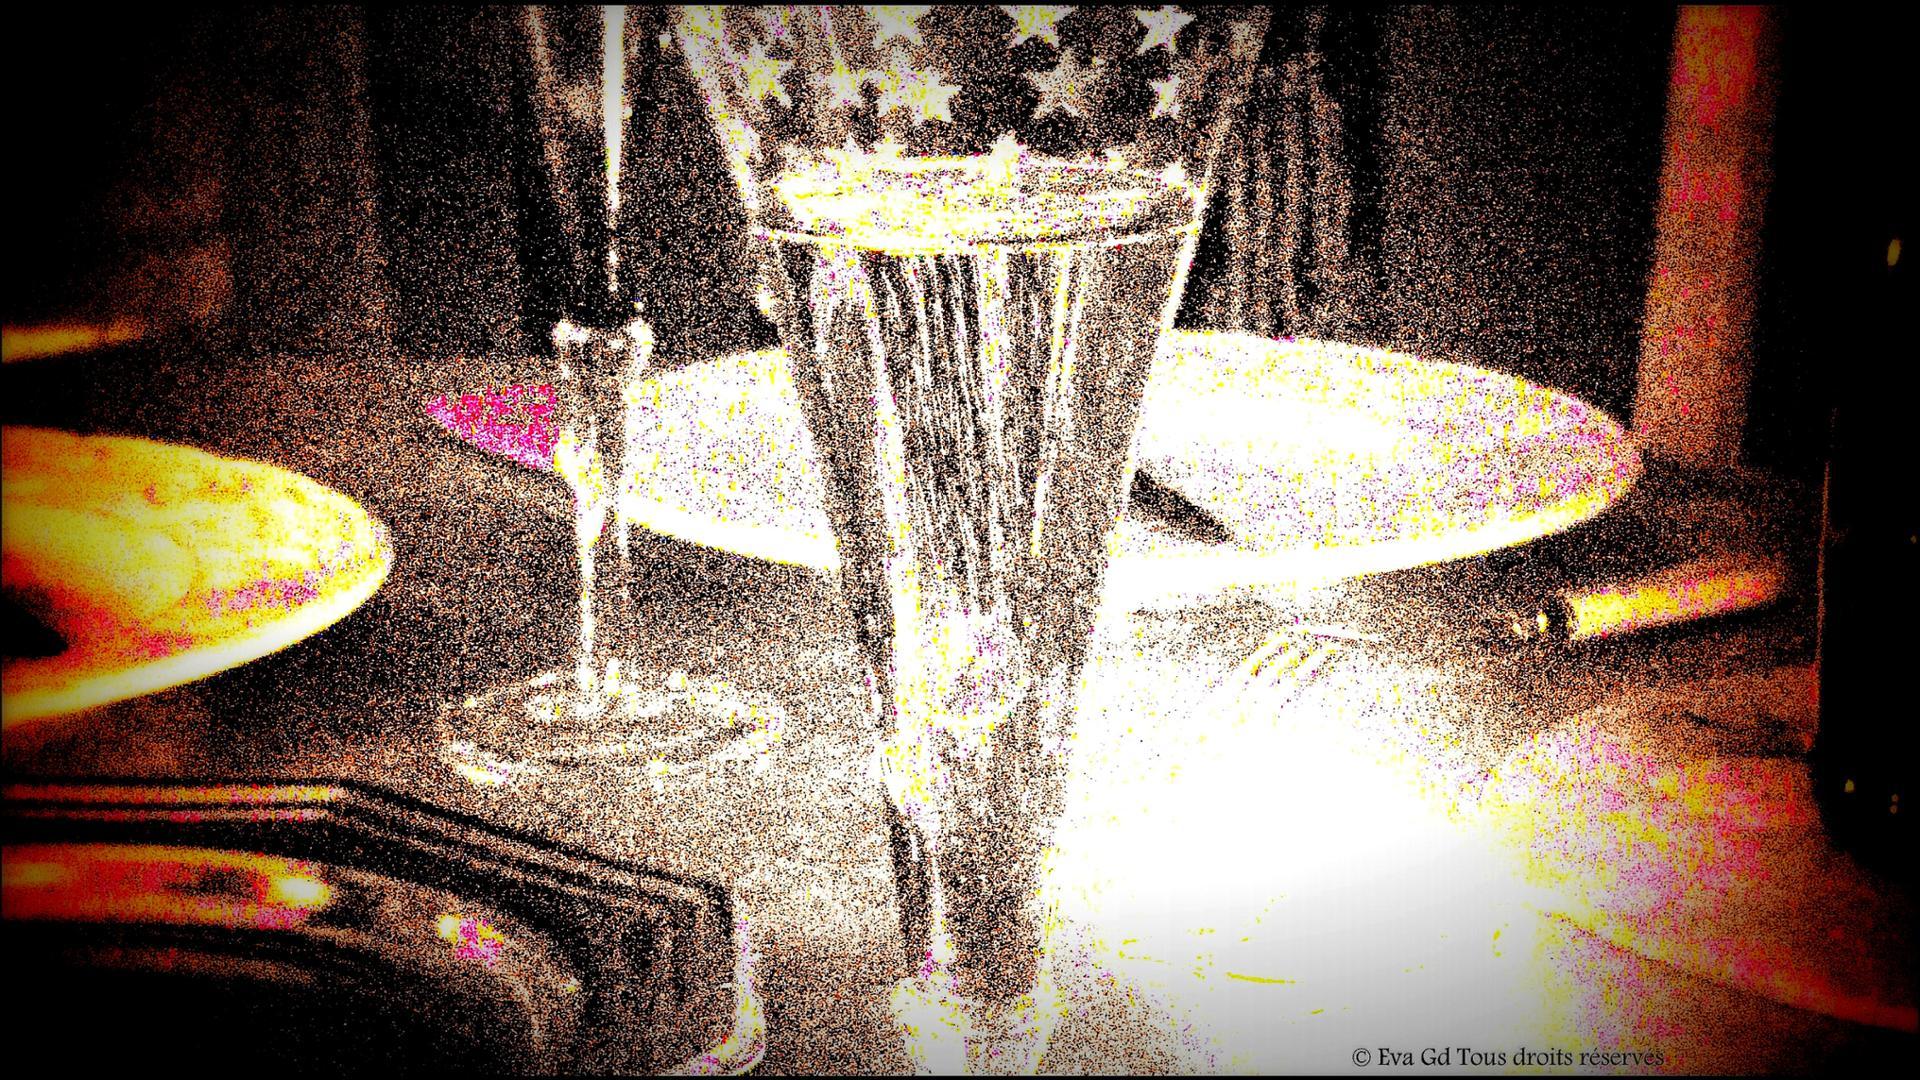 Champagne ...!